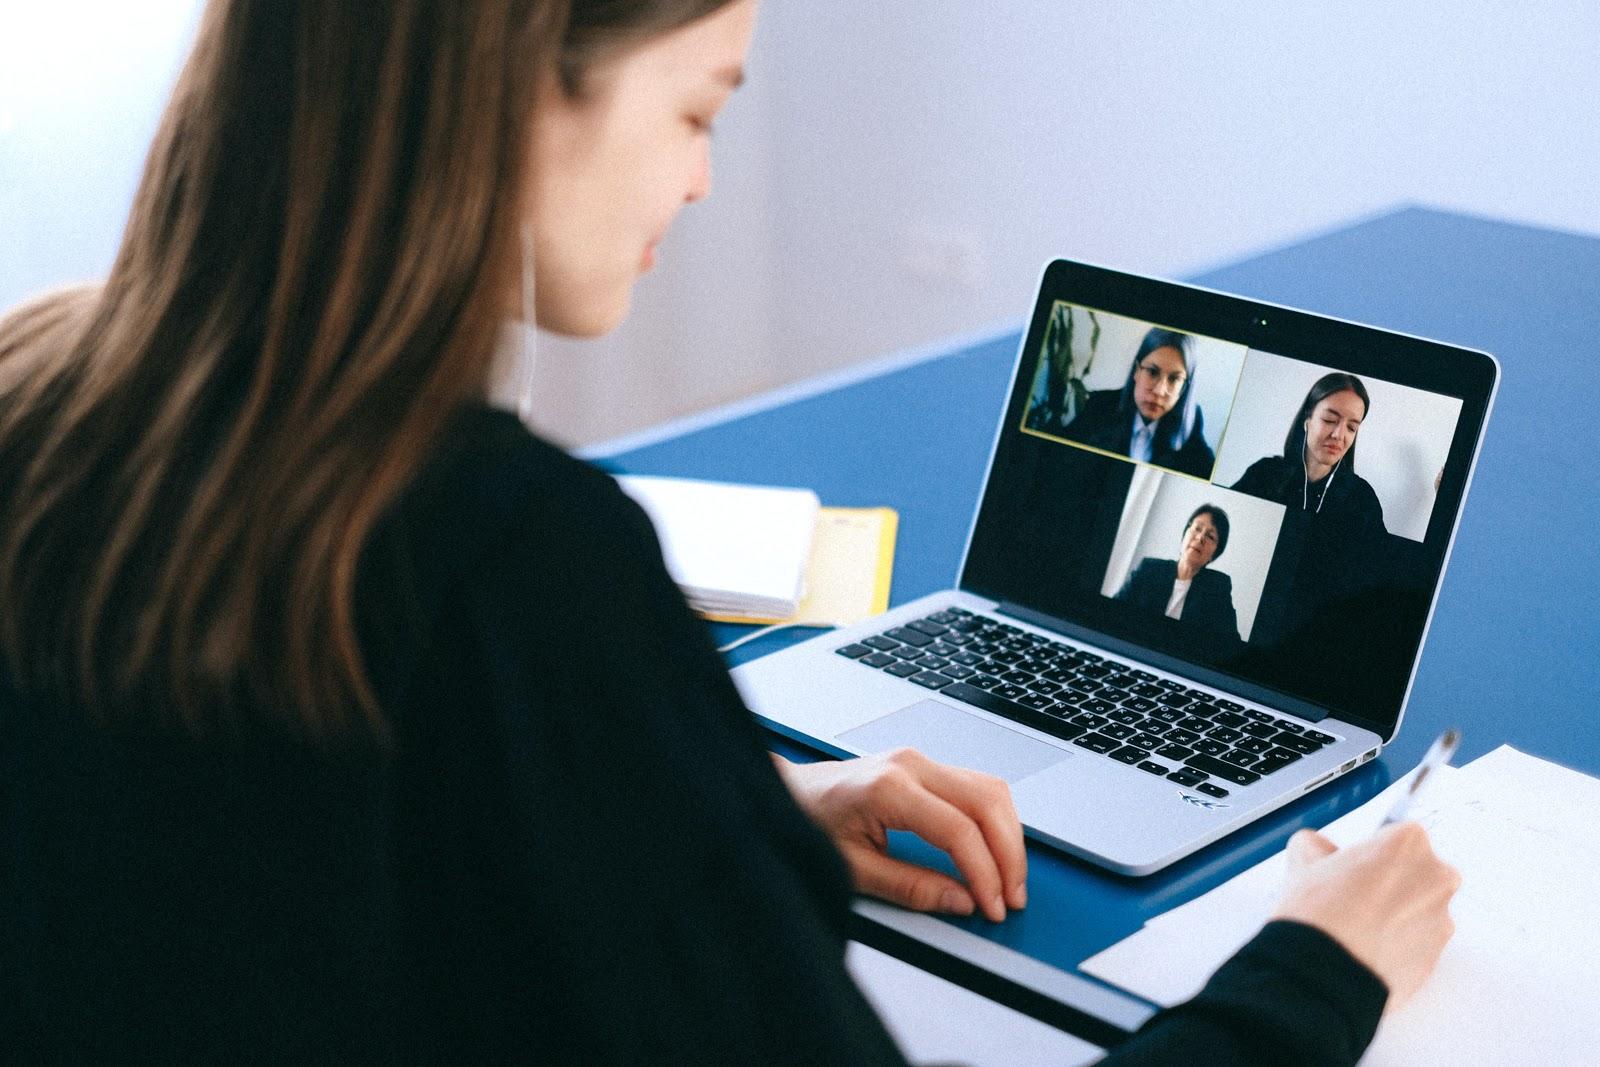 woman working online on laptop